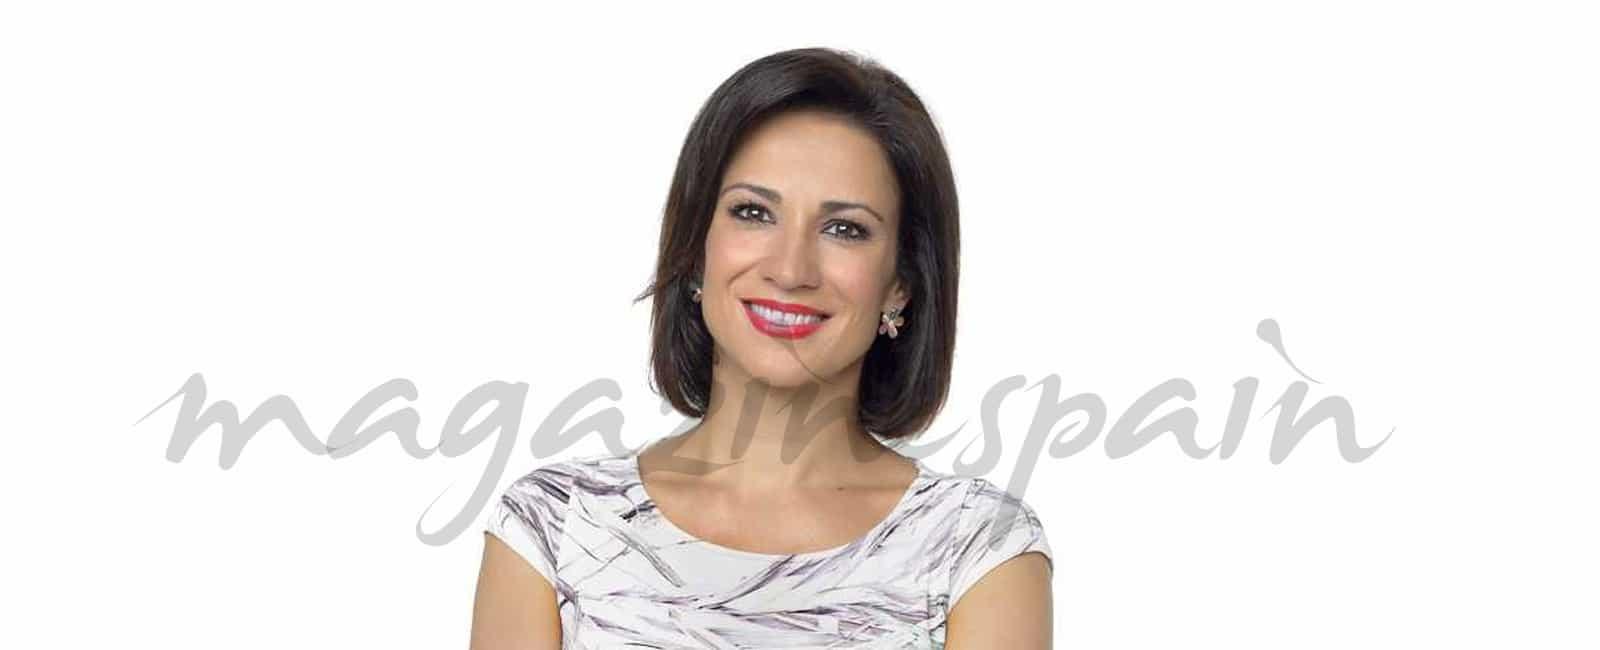 Silvia Jato sustituye a Mariló Montero